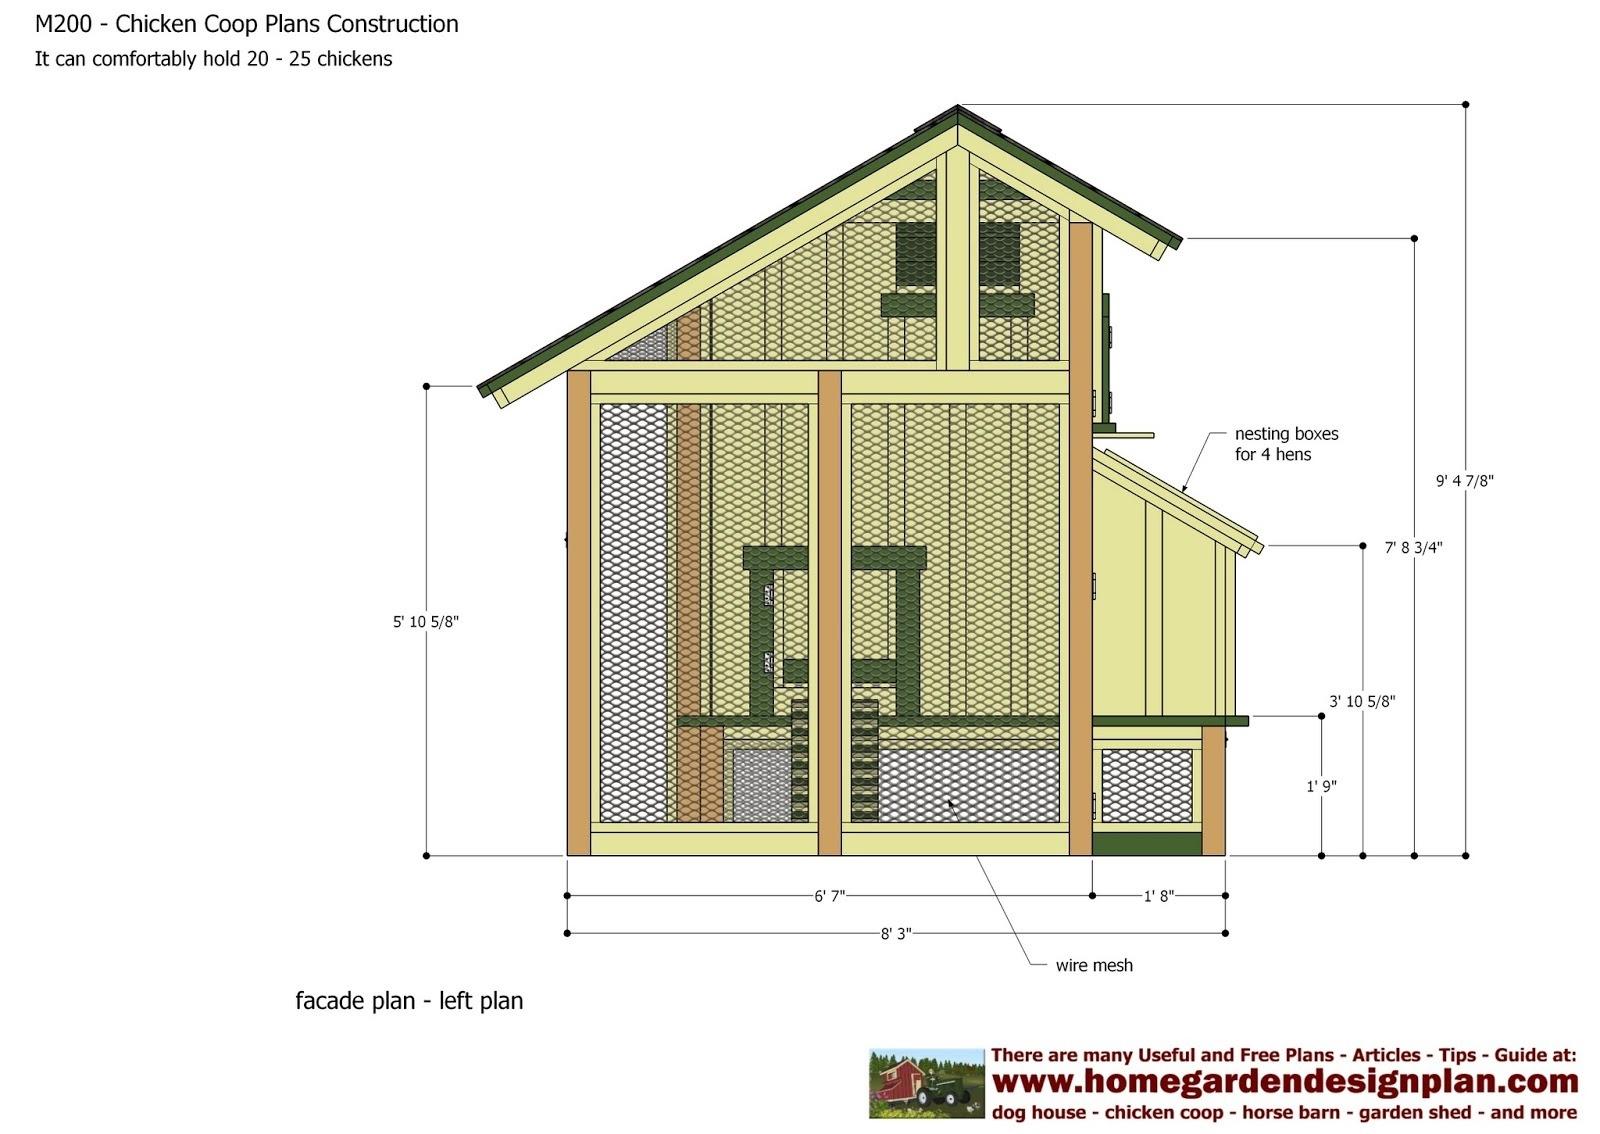 Free Printable Chicken Coop Plans | Bestprintable231118 - Free Printable Chicken Coop Plans